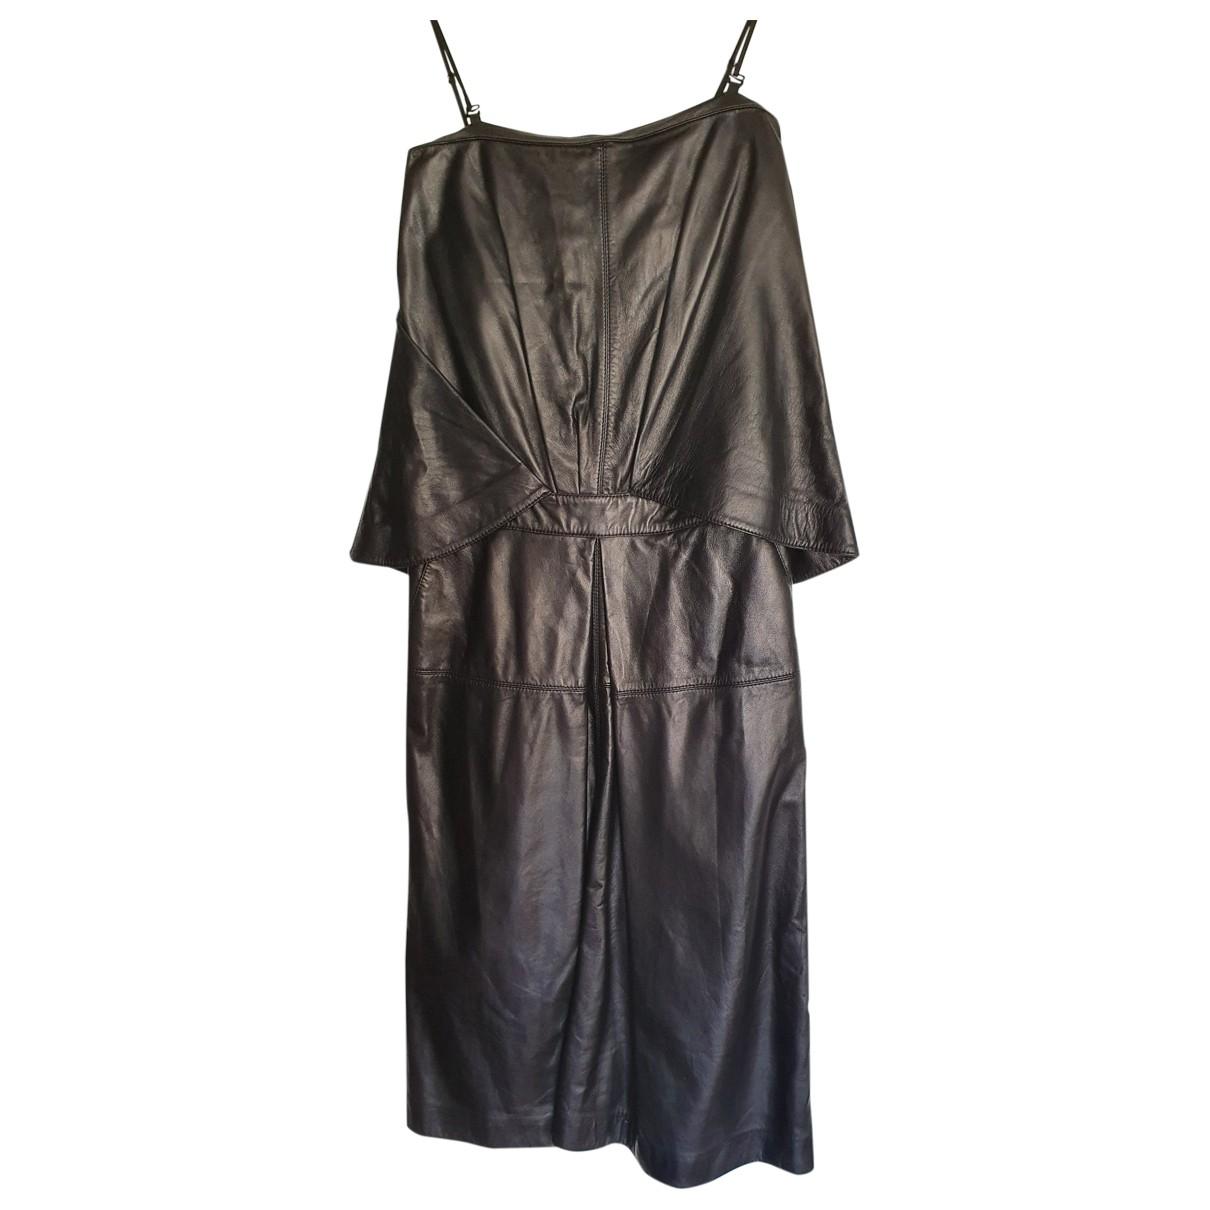 Mcq \N Black Leather dress for Women 36 FR